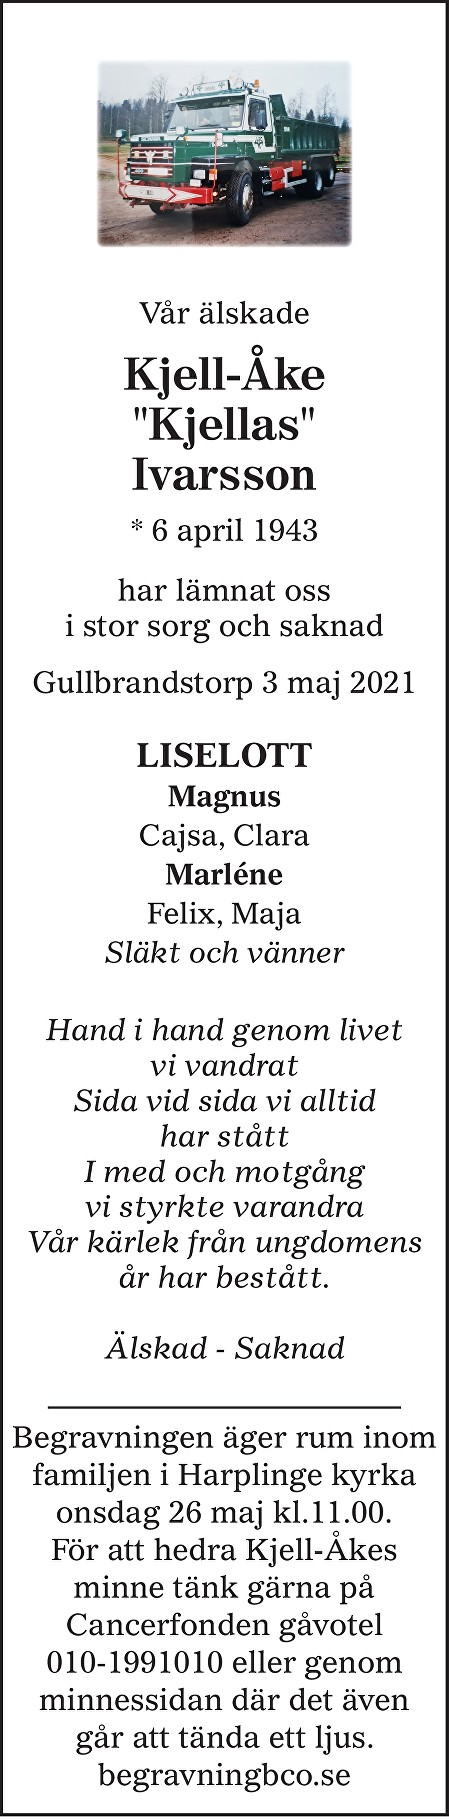 "Kjell-Åke ""Kjellas"" Ivarsson Death notice"